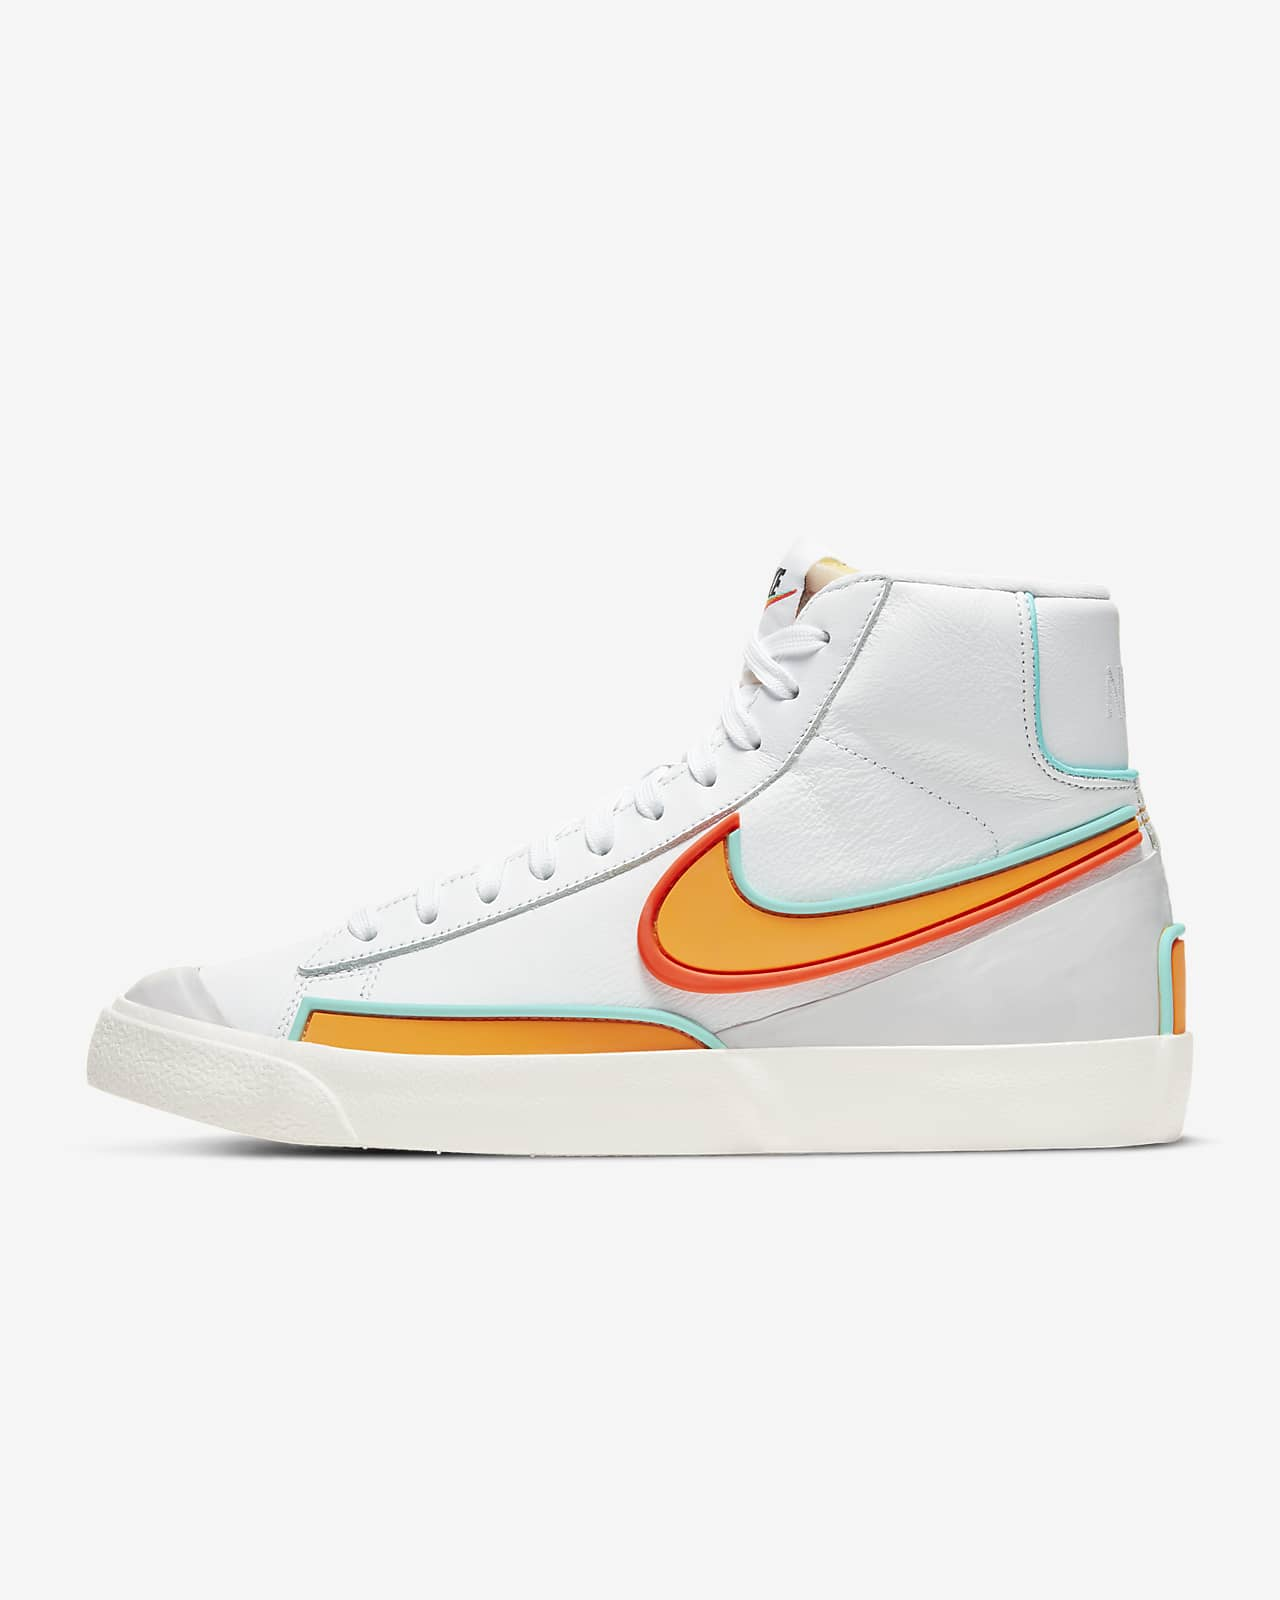 Nike Blazer Mid '77 Infinite 女子运动鞋